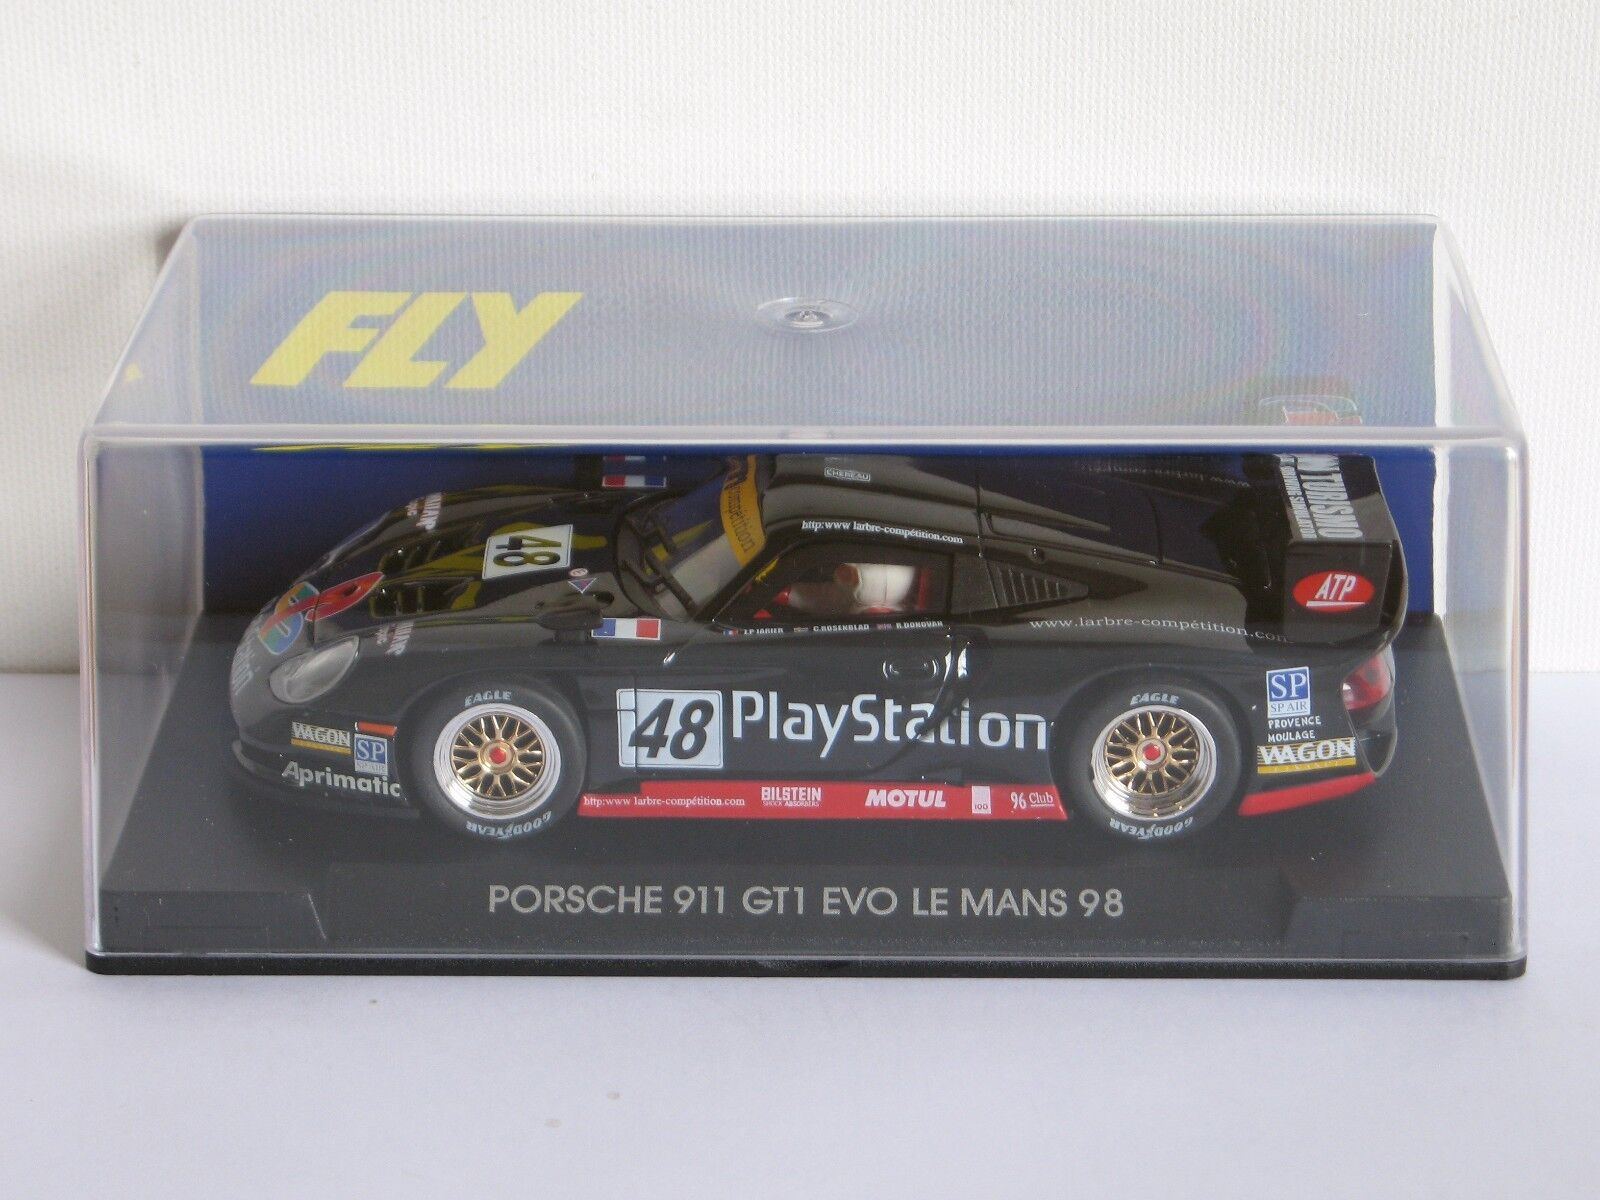 FLY Car Porsche 911 GT1 EVO Le Mans 1998 PlayStation - Ref. A55